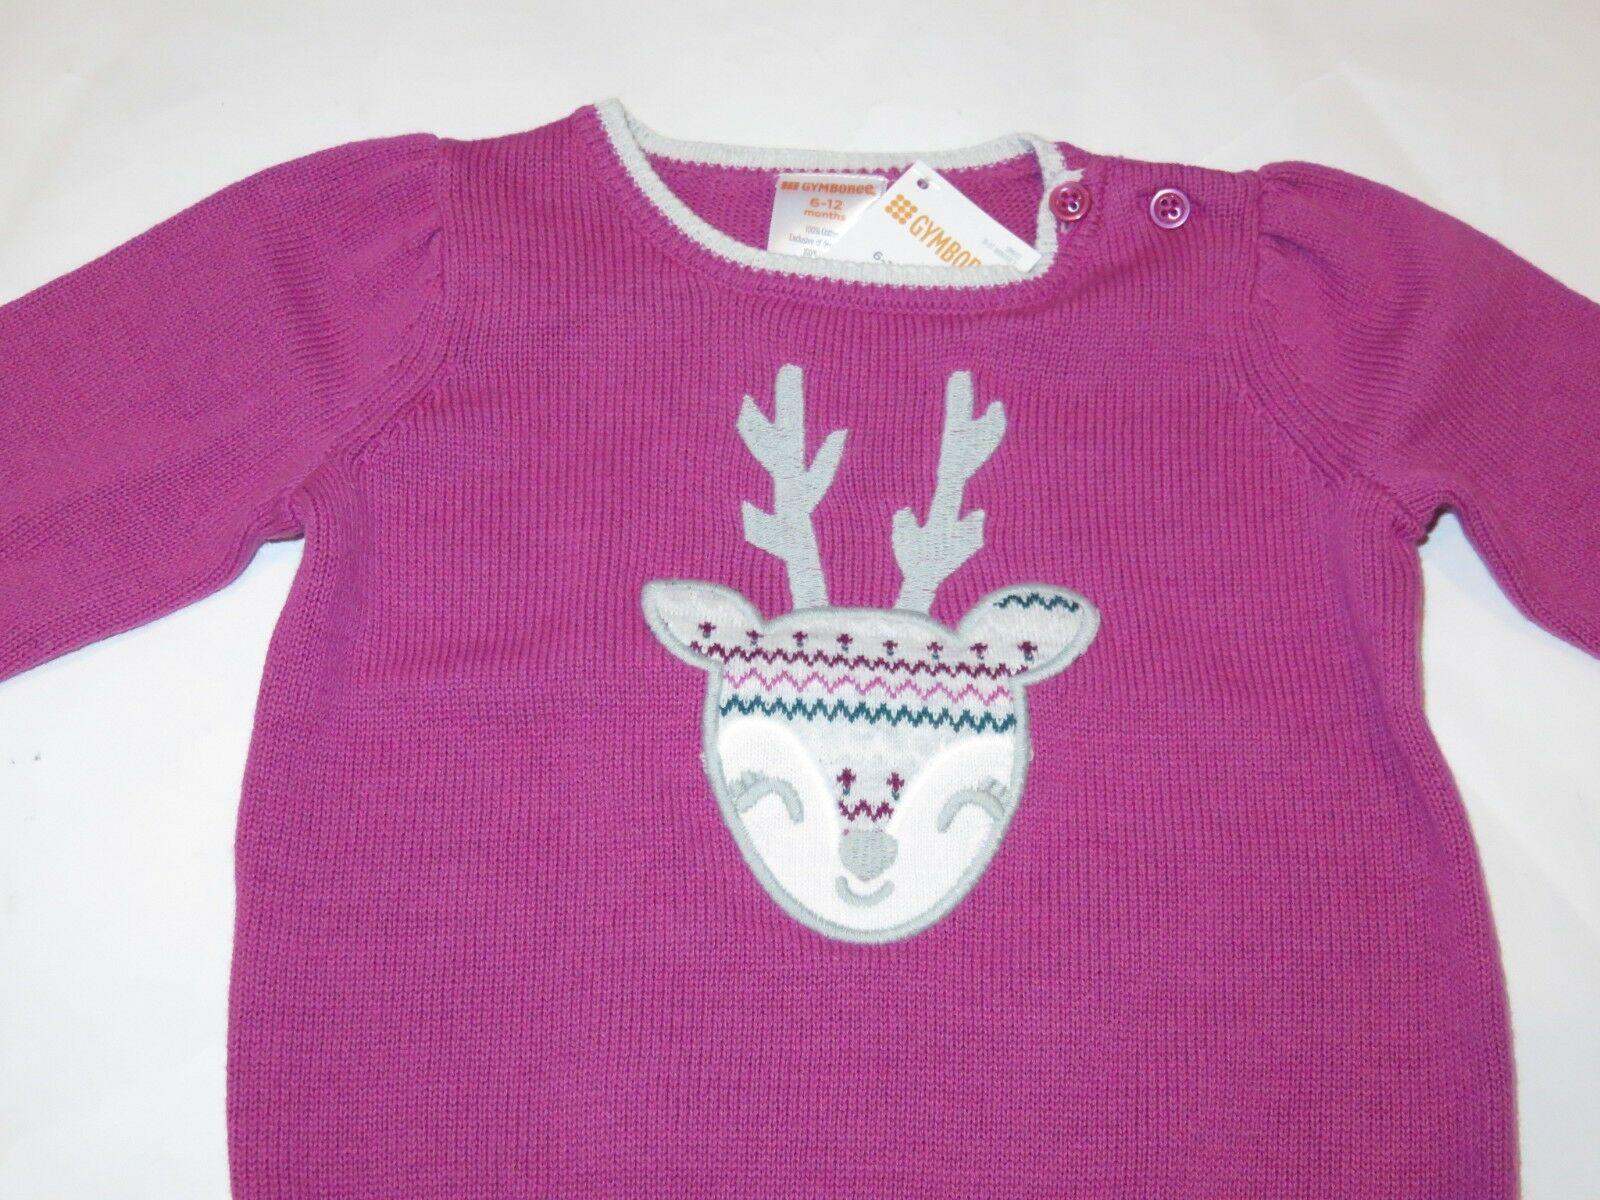 740194bf3bd Gymboree Baby Girl Fairisle Deer sweater and 11 similar items